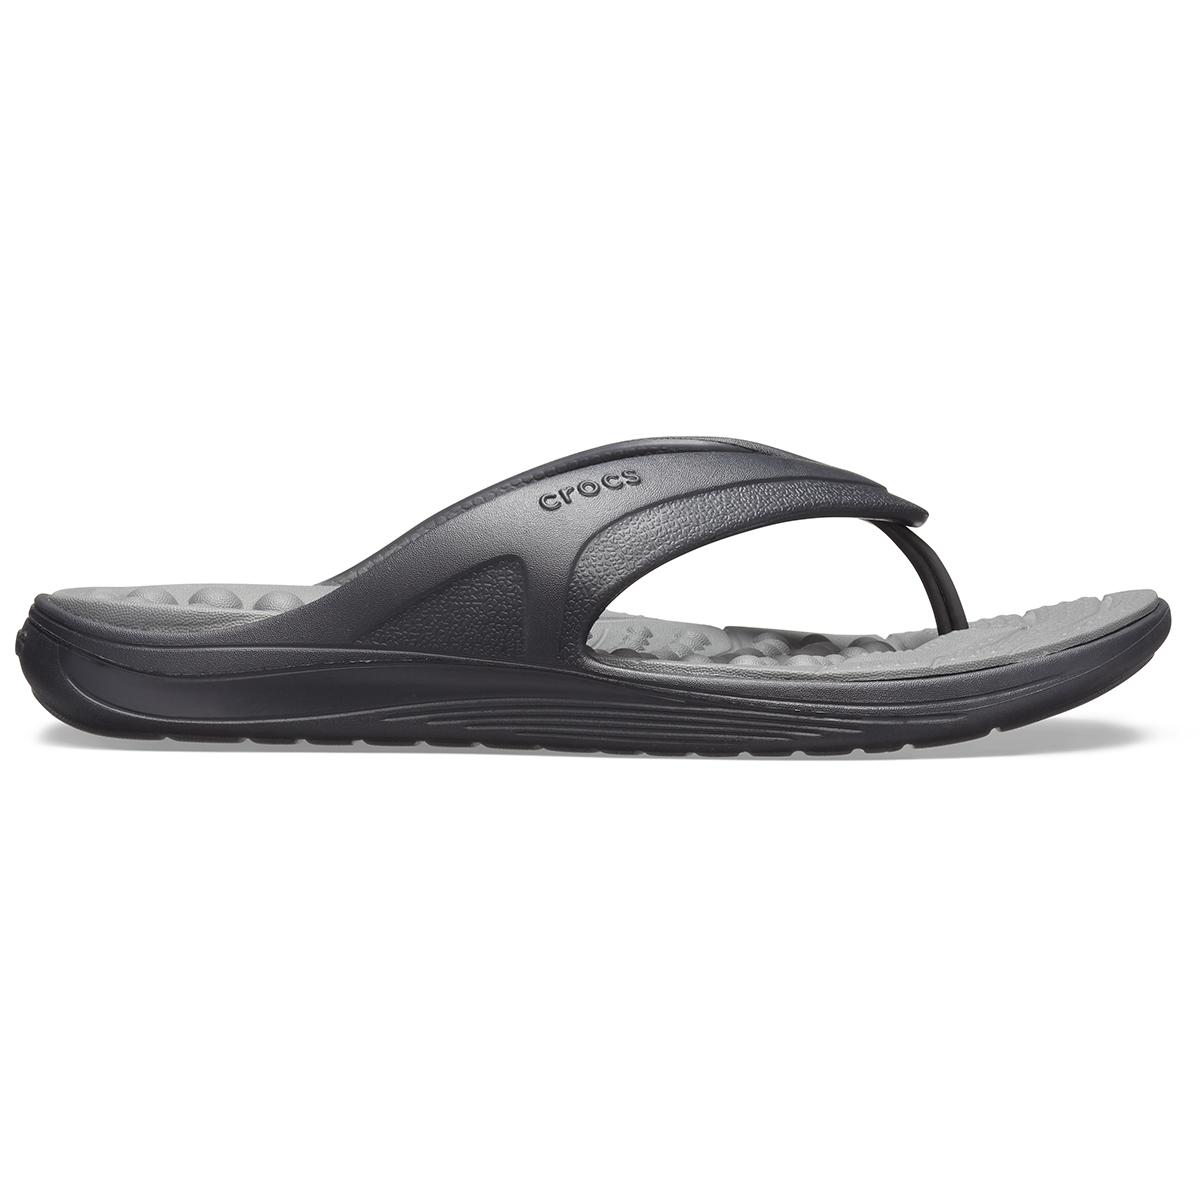 Crocs Reviva Flip - Siyah/Barut Rengi